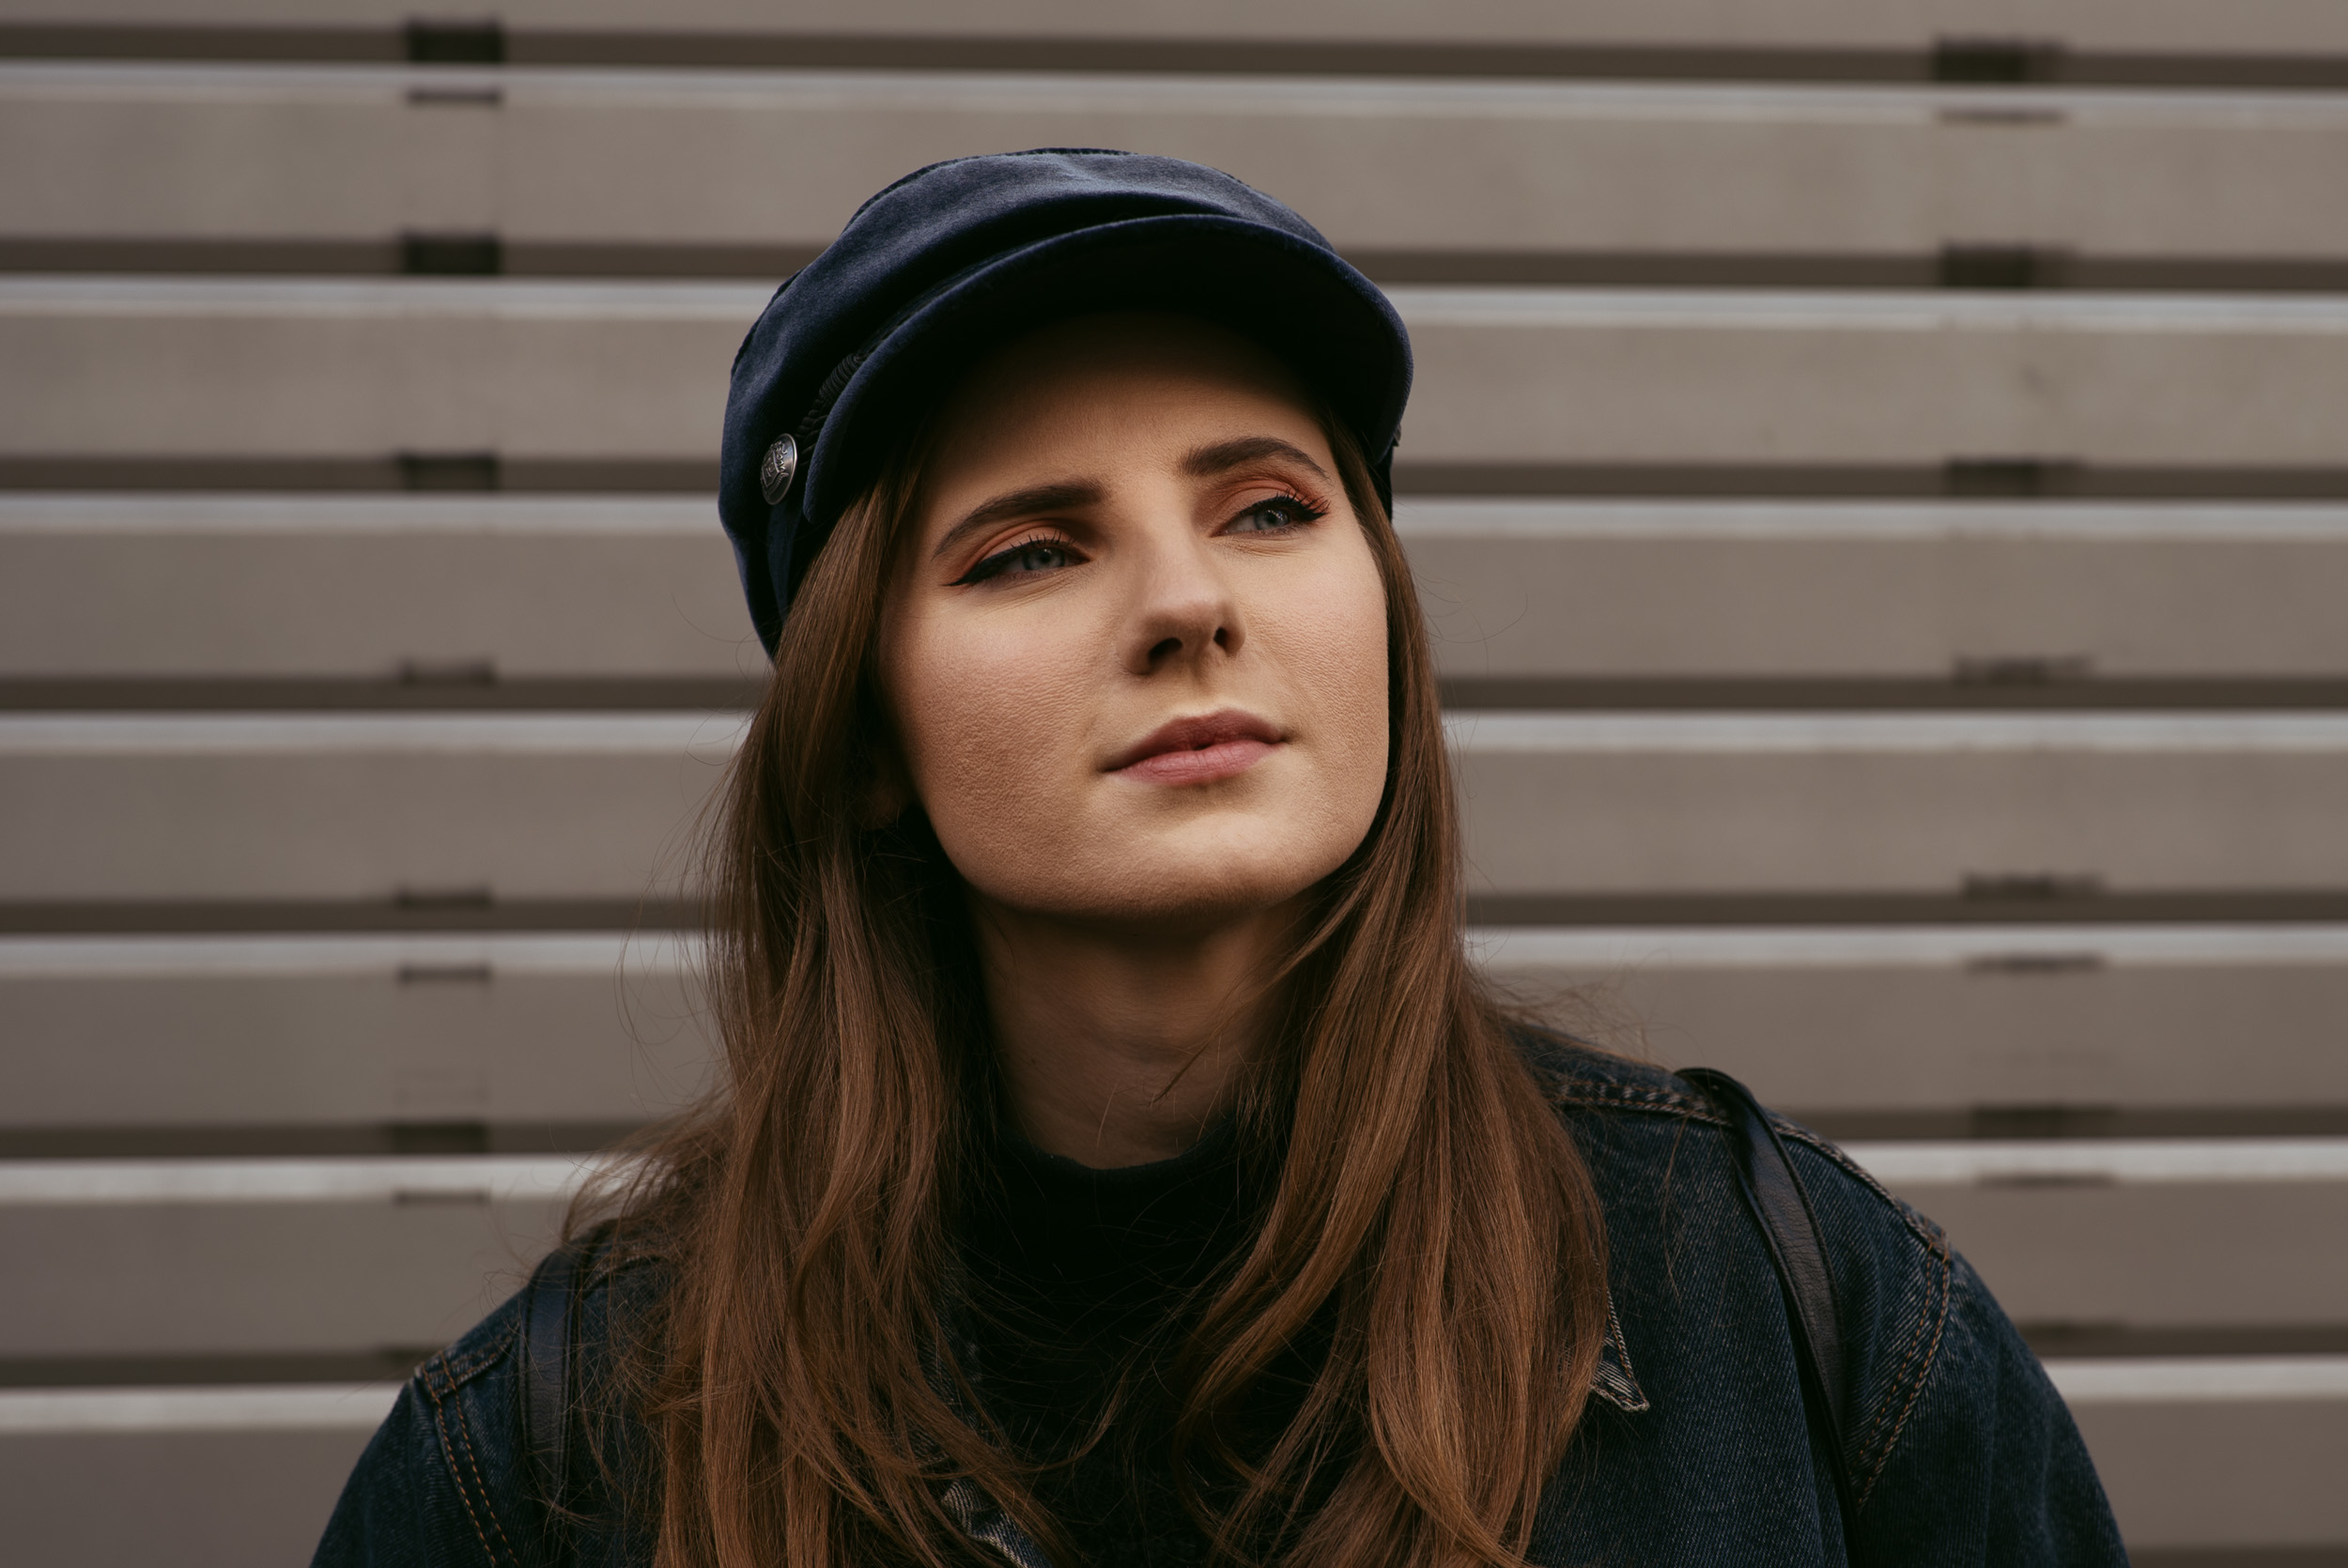 Portrait Fotografie Jennifer Steinbach | Jill Abanico - Fotografie - Ruhrgebiet